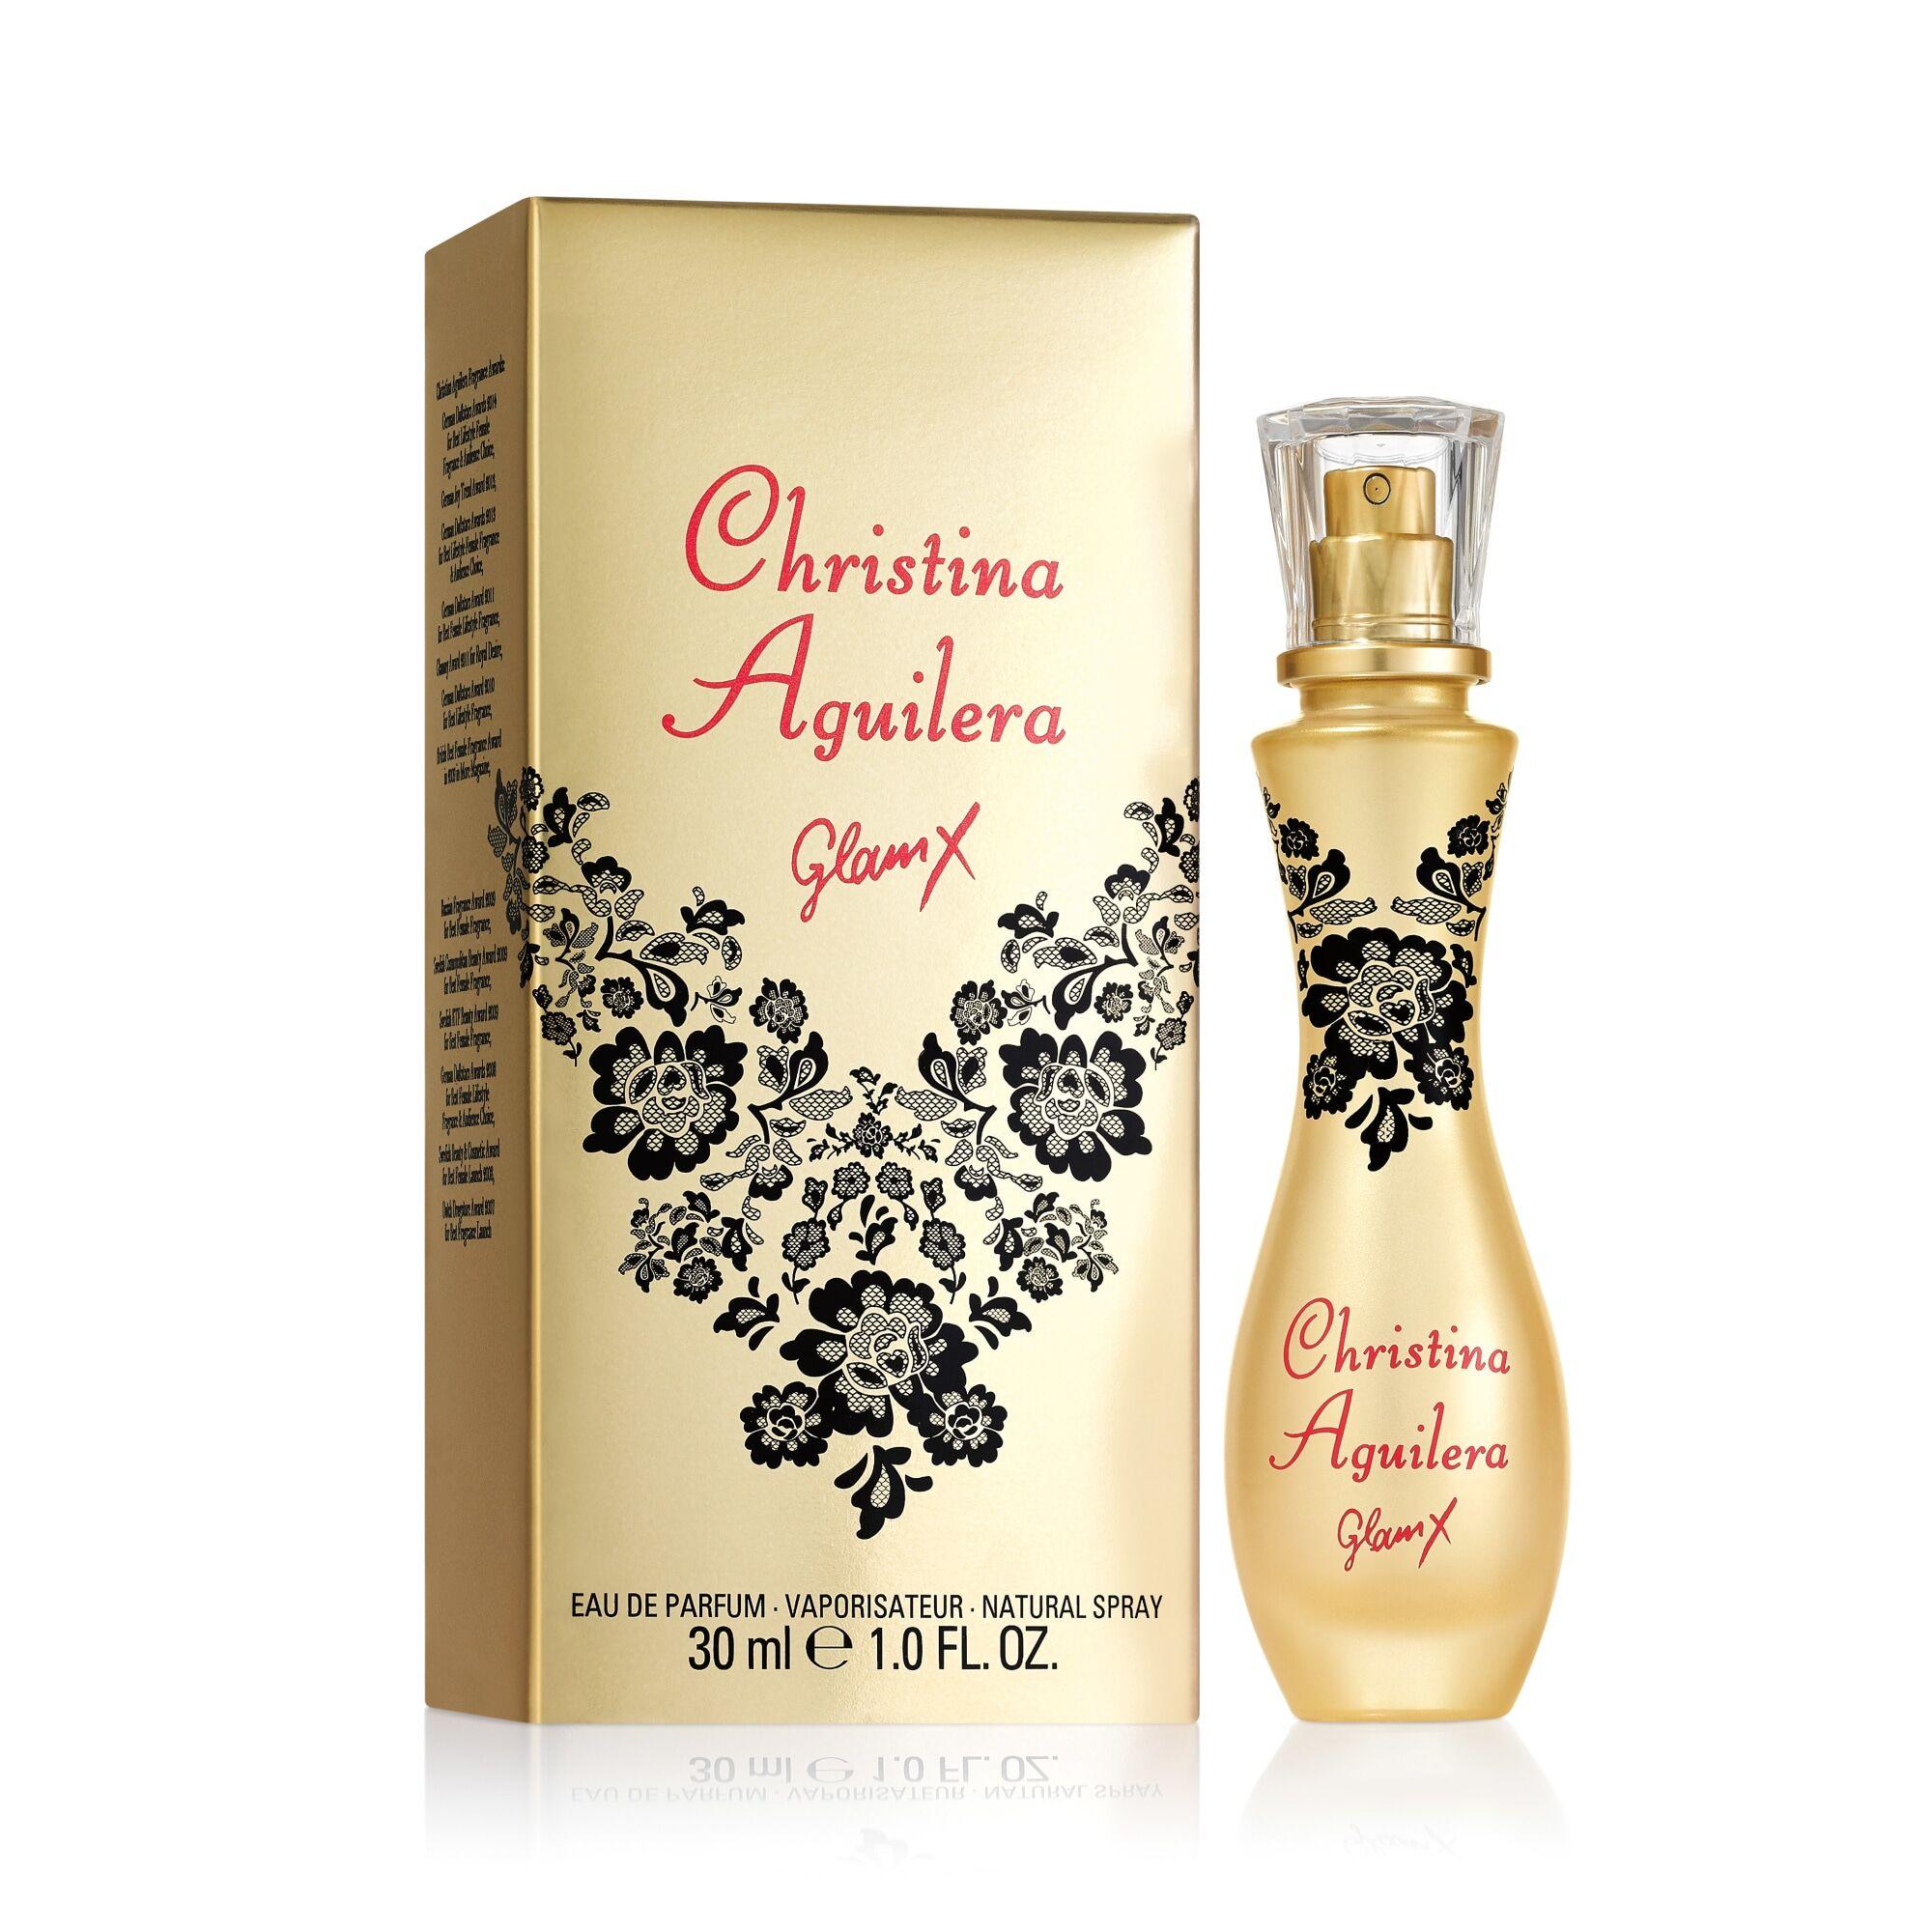 Christina Aguilera Glam X 30 ml Edp naisten parfyymi